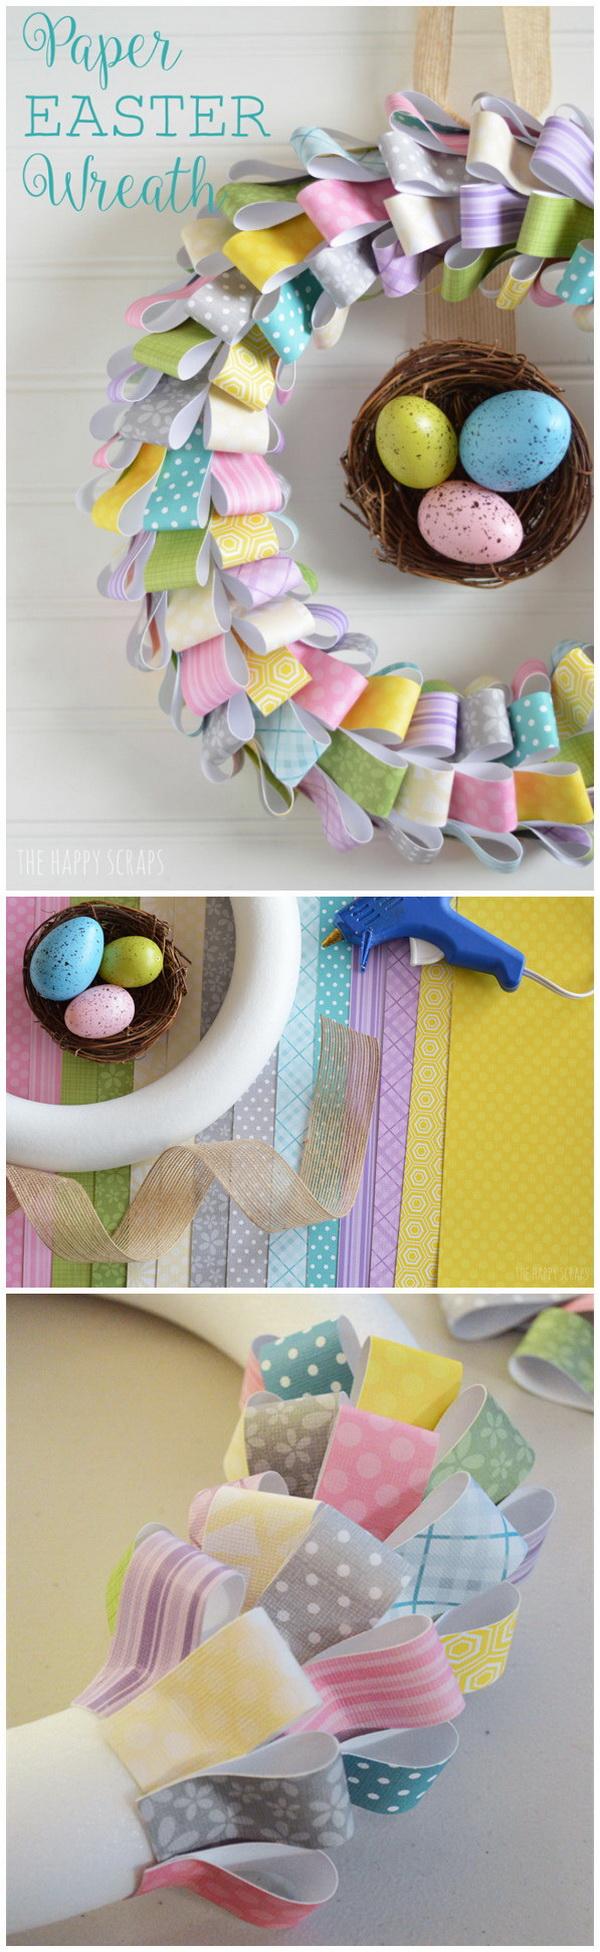 DIY Easter Wreath Ideas: Paper Easter Wreath.